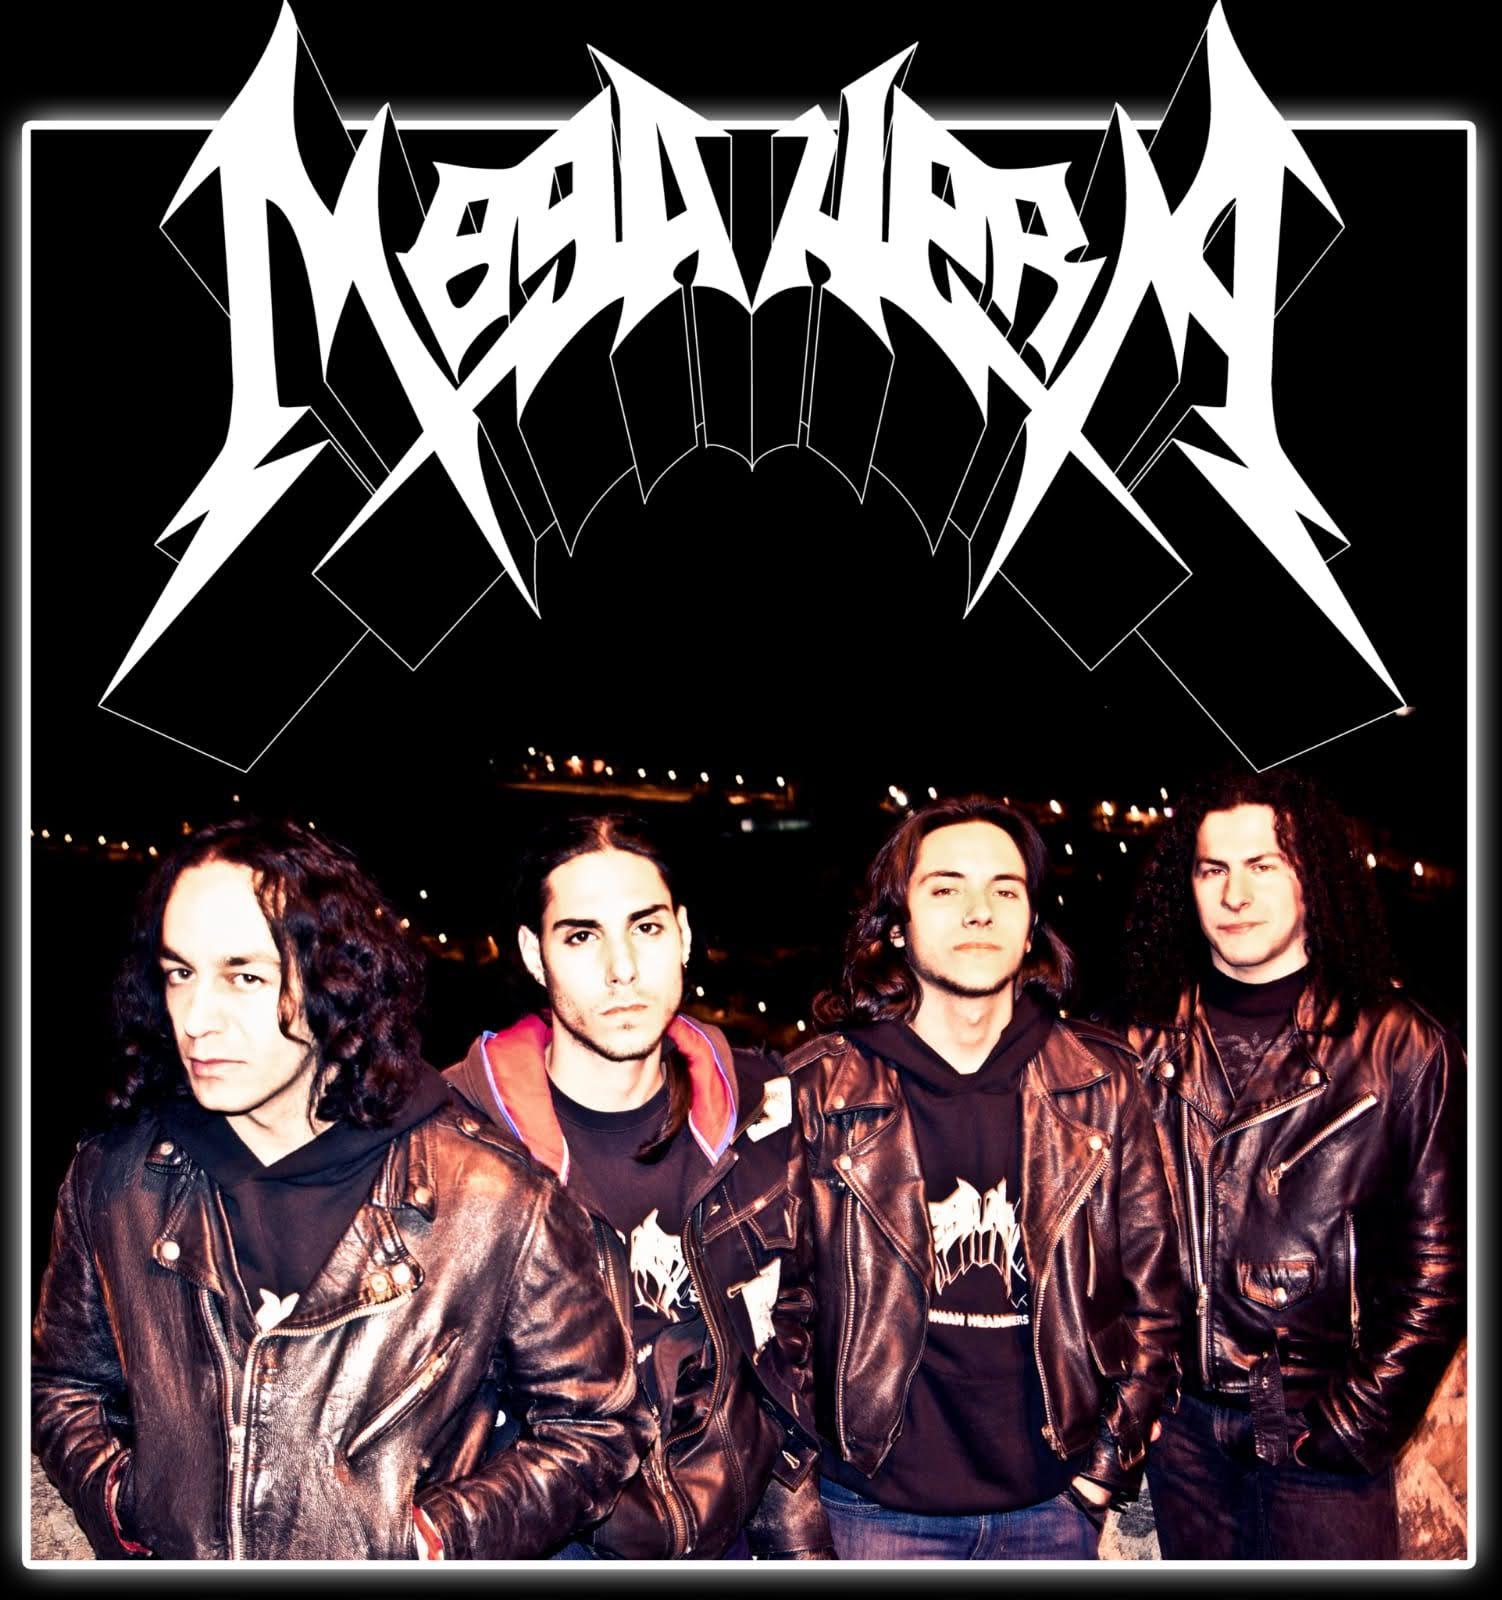 Megahera - Photo